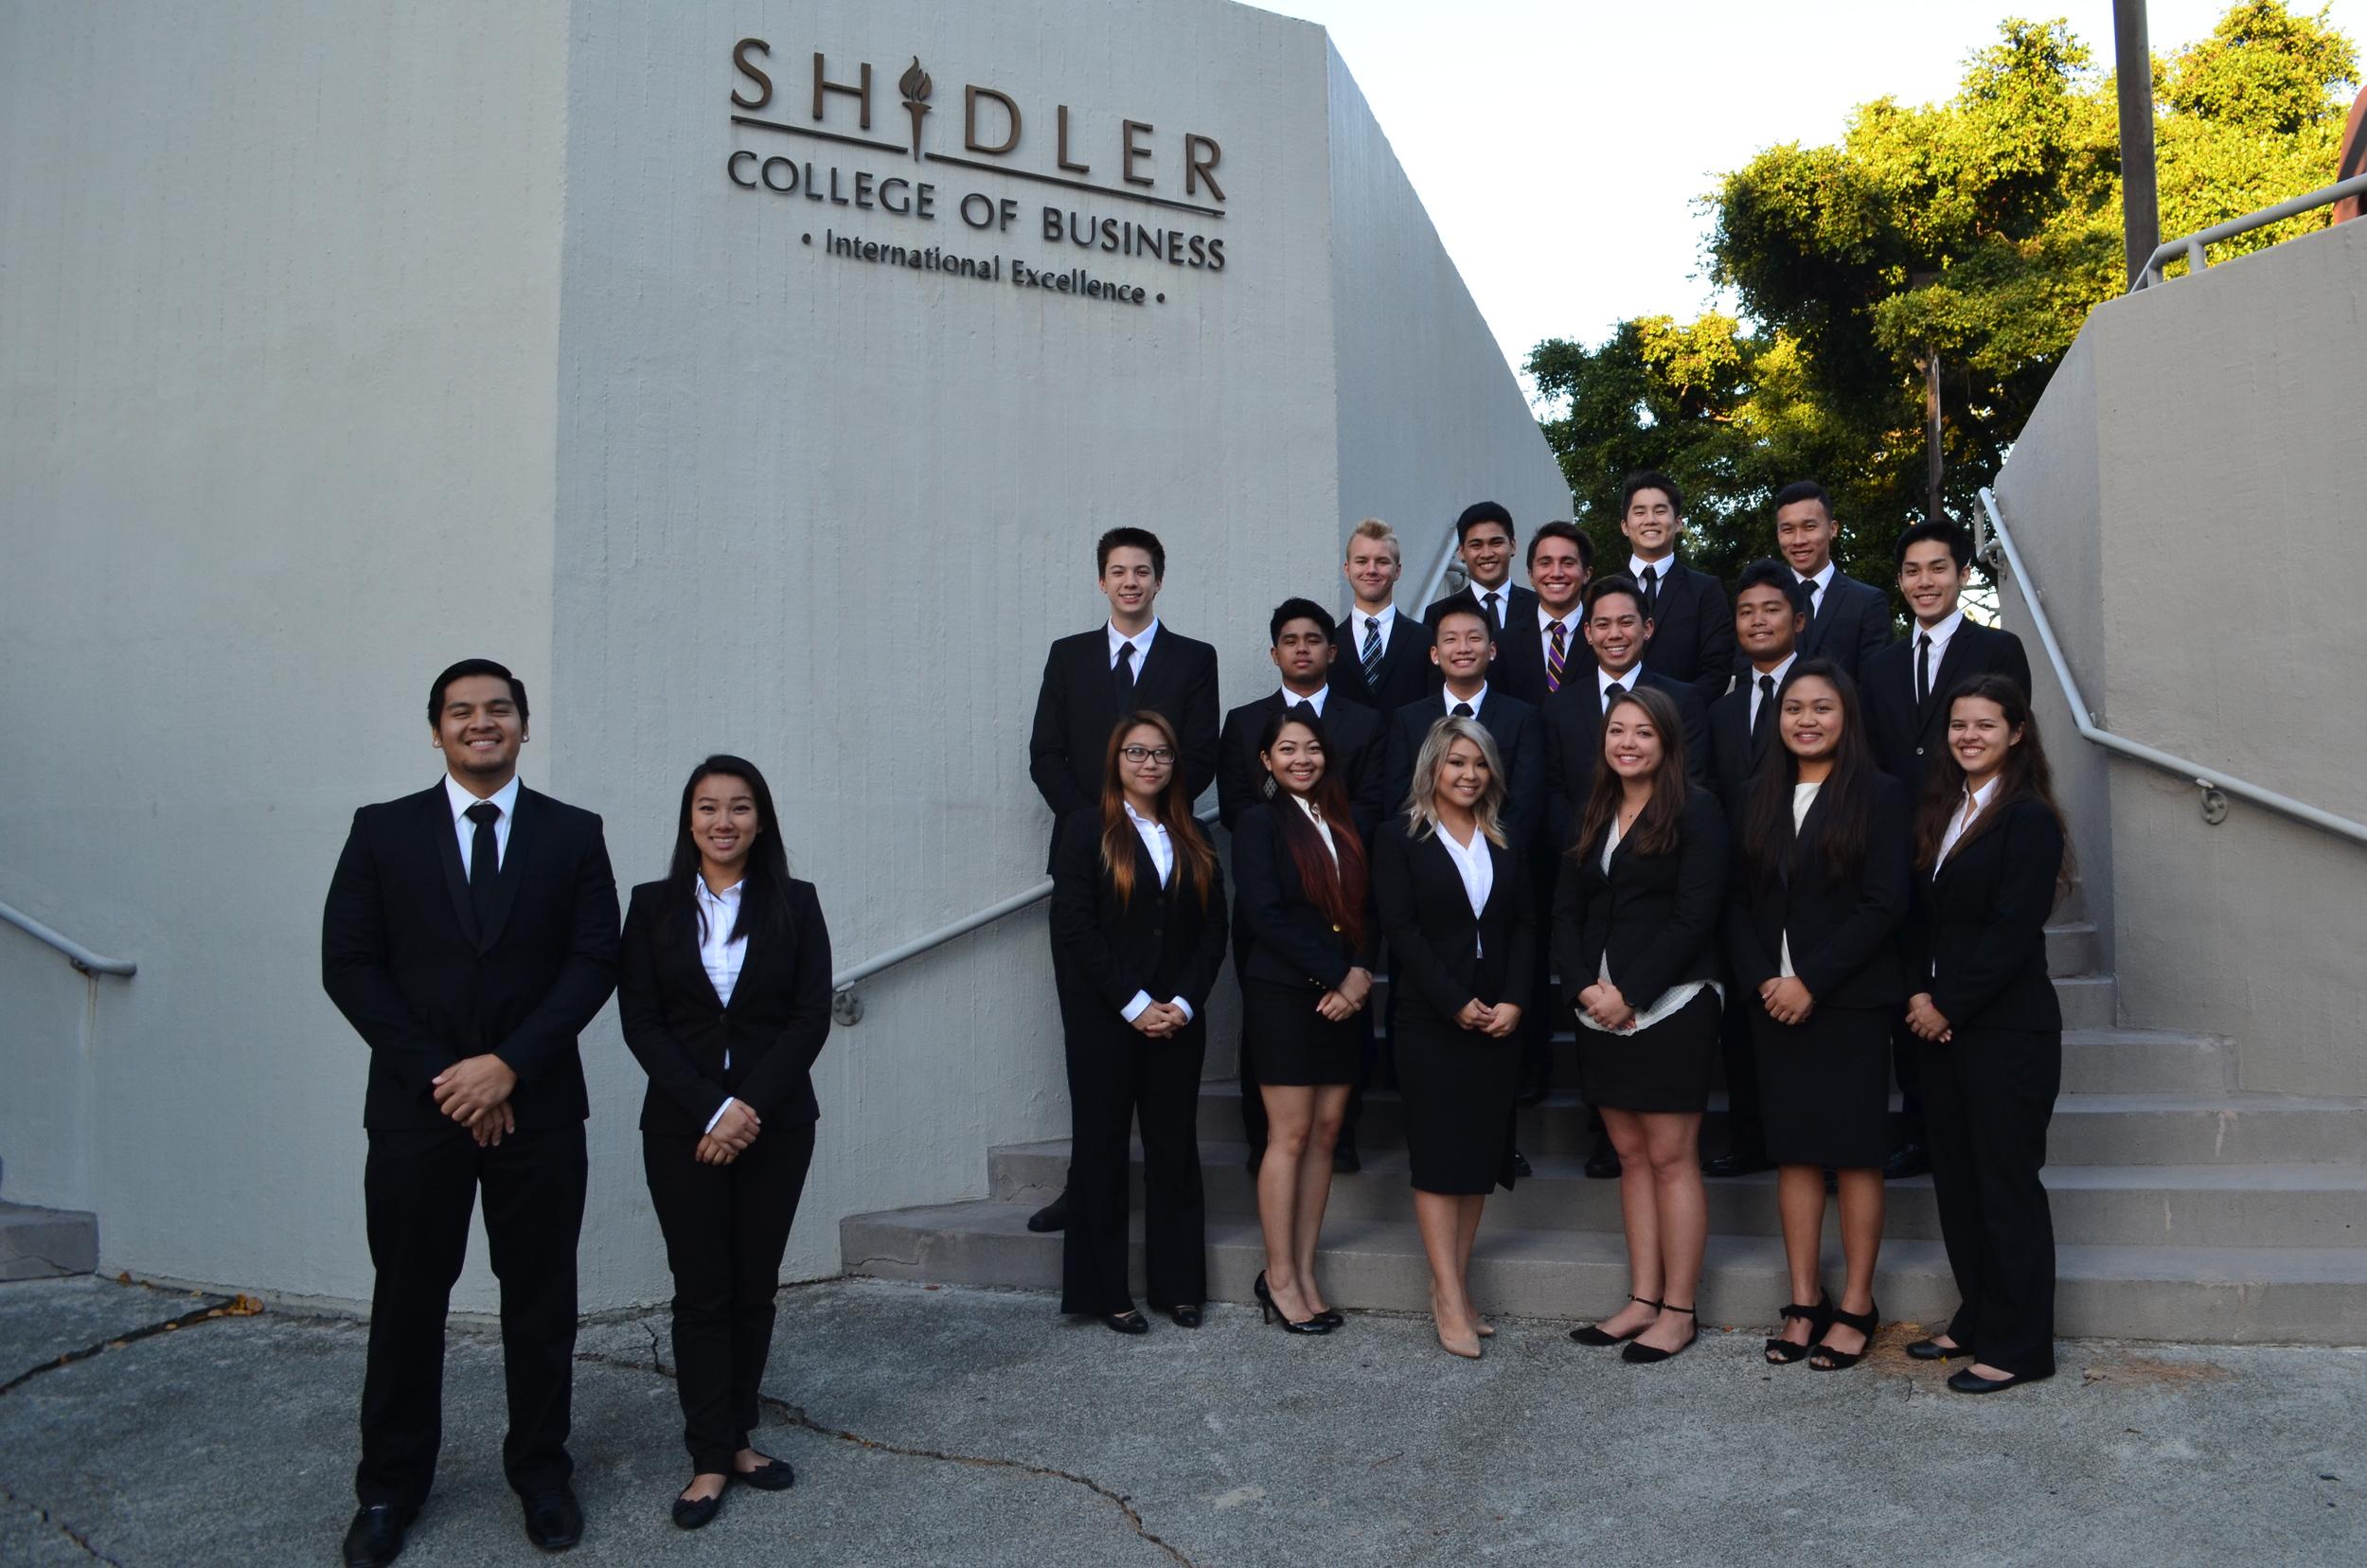 The Epsilon class: 19 members, initiated Fall 2014